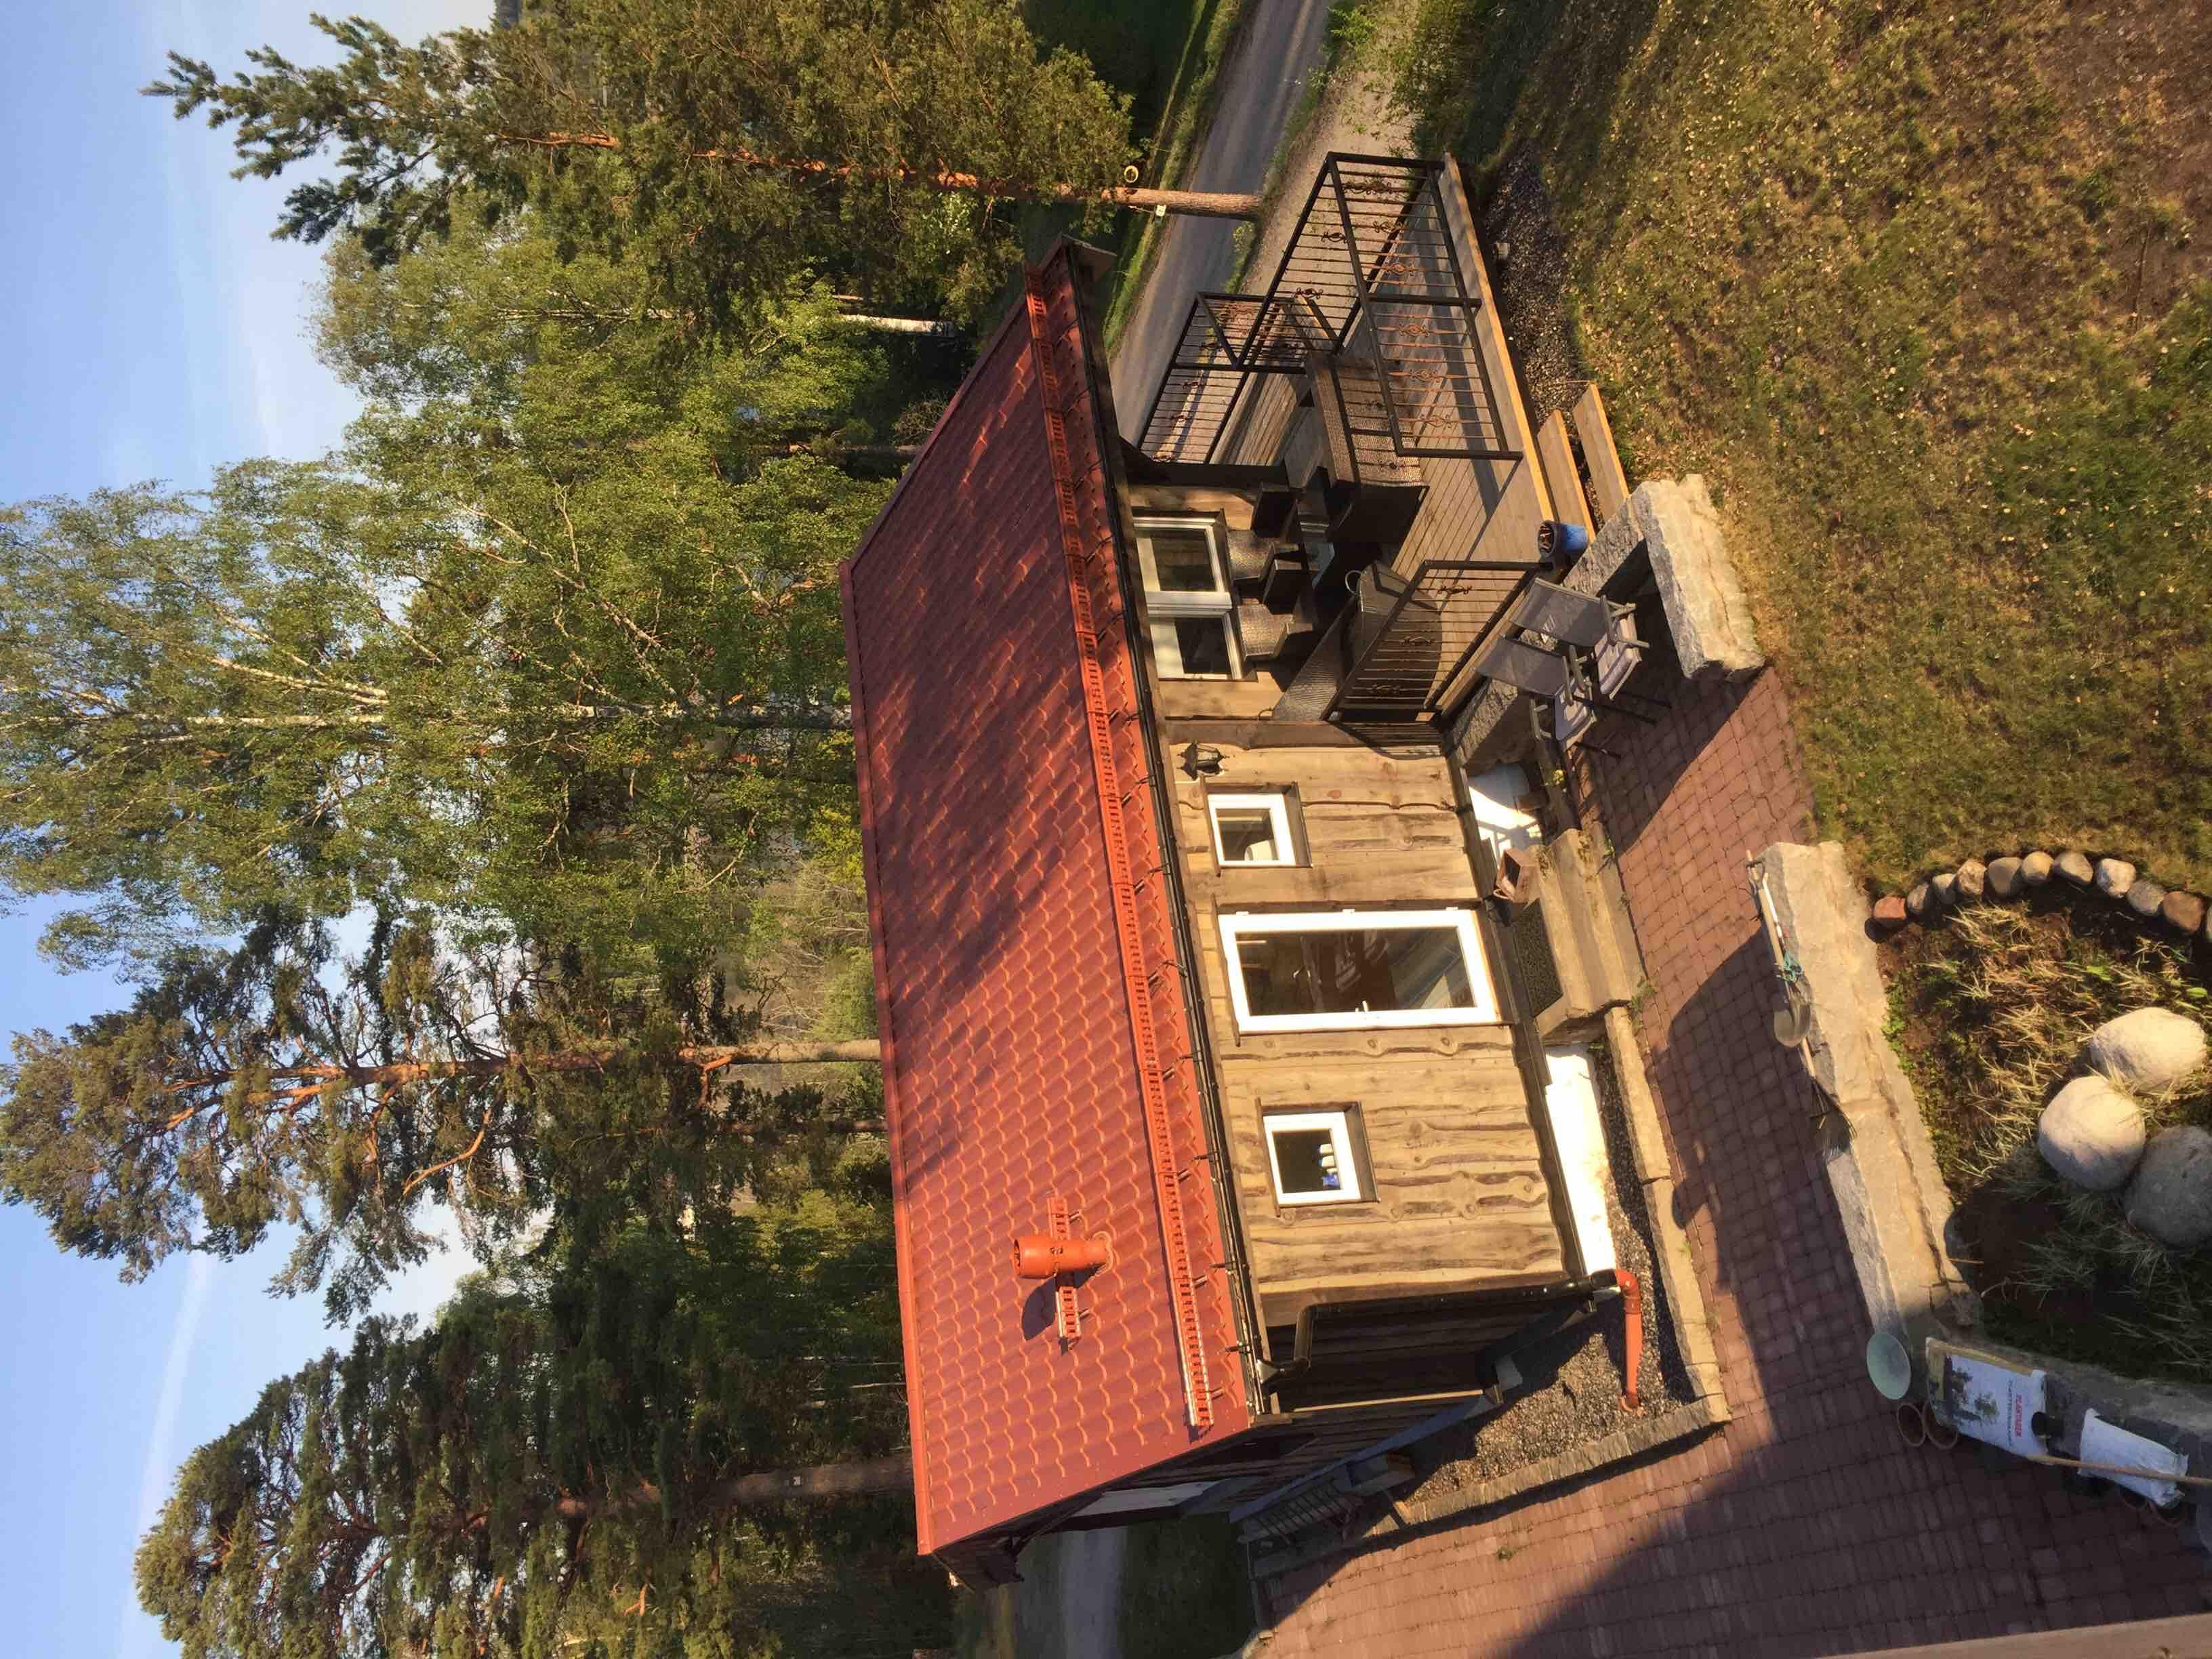 Grdshus Bergeforsen/Timr - Houses for Rent in - Airbnb